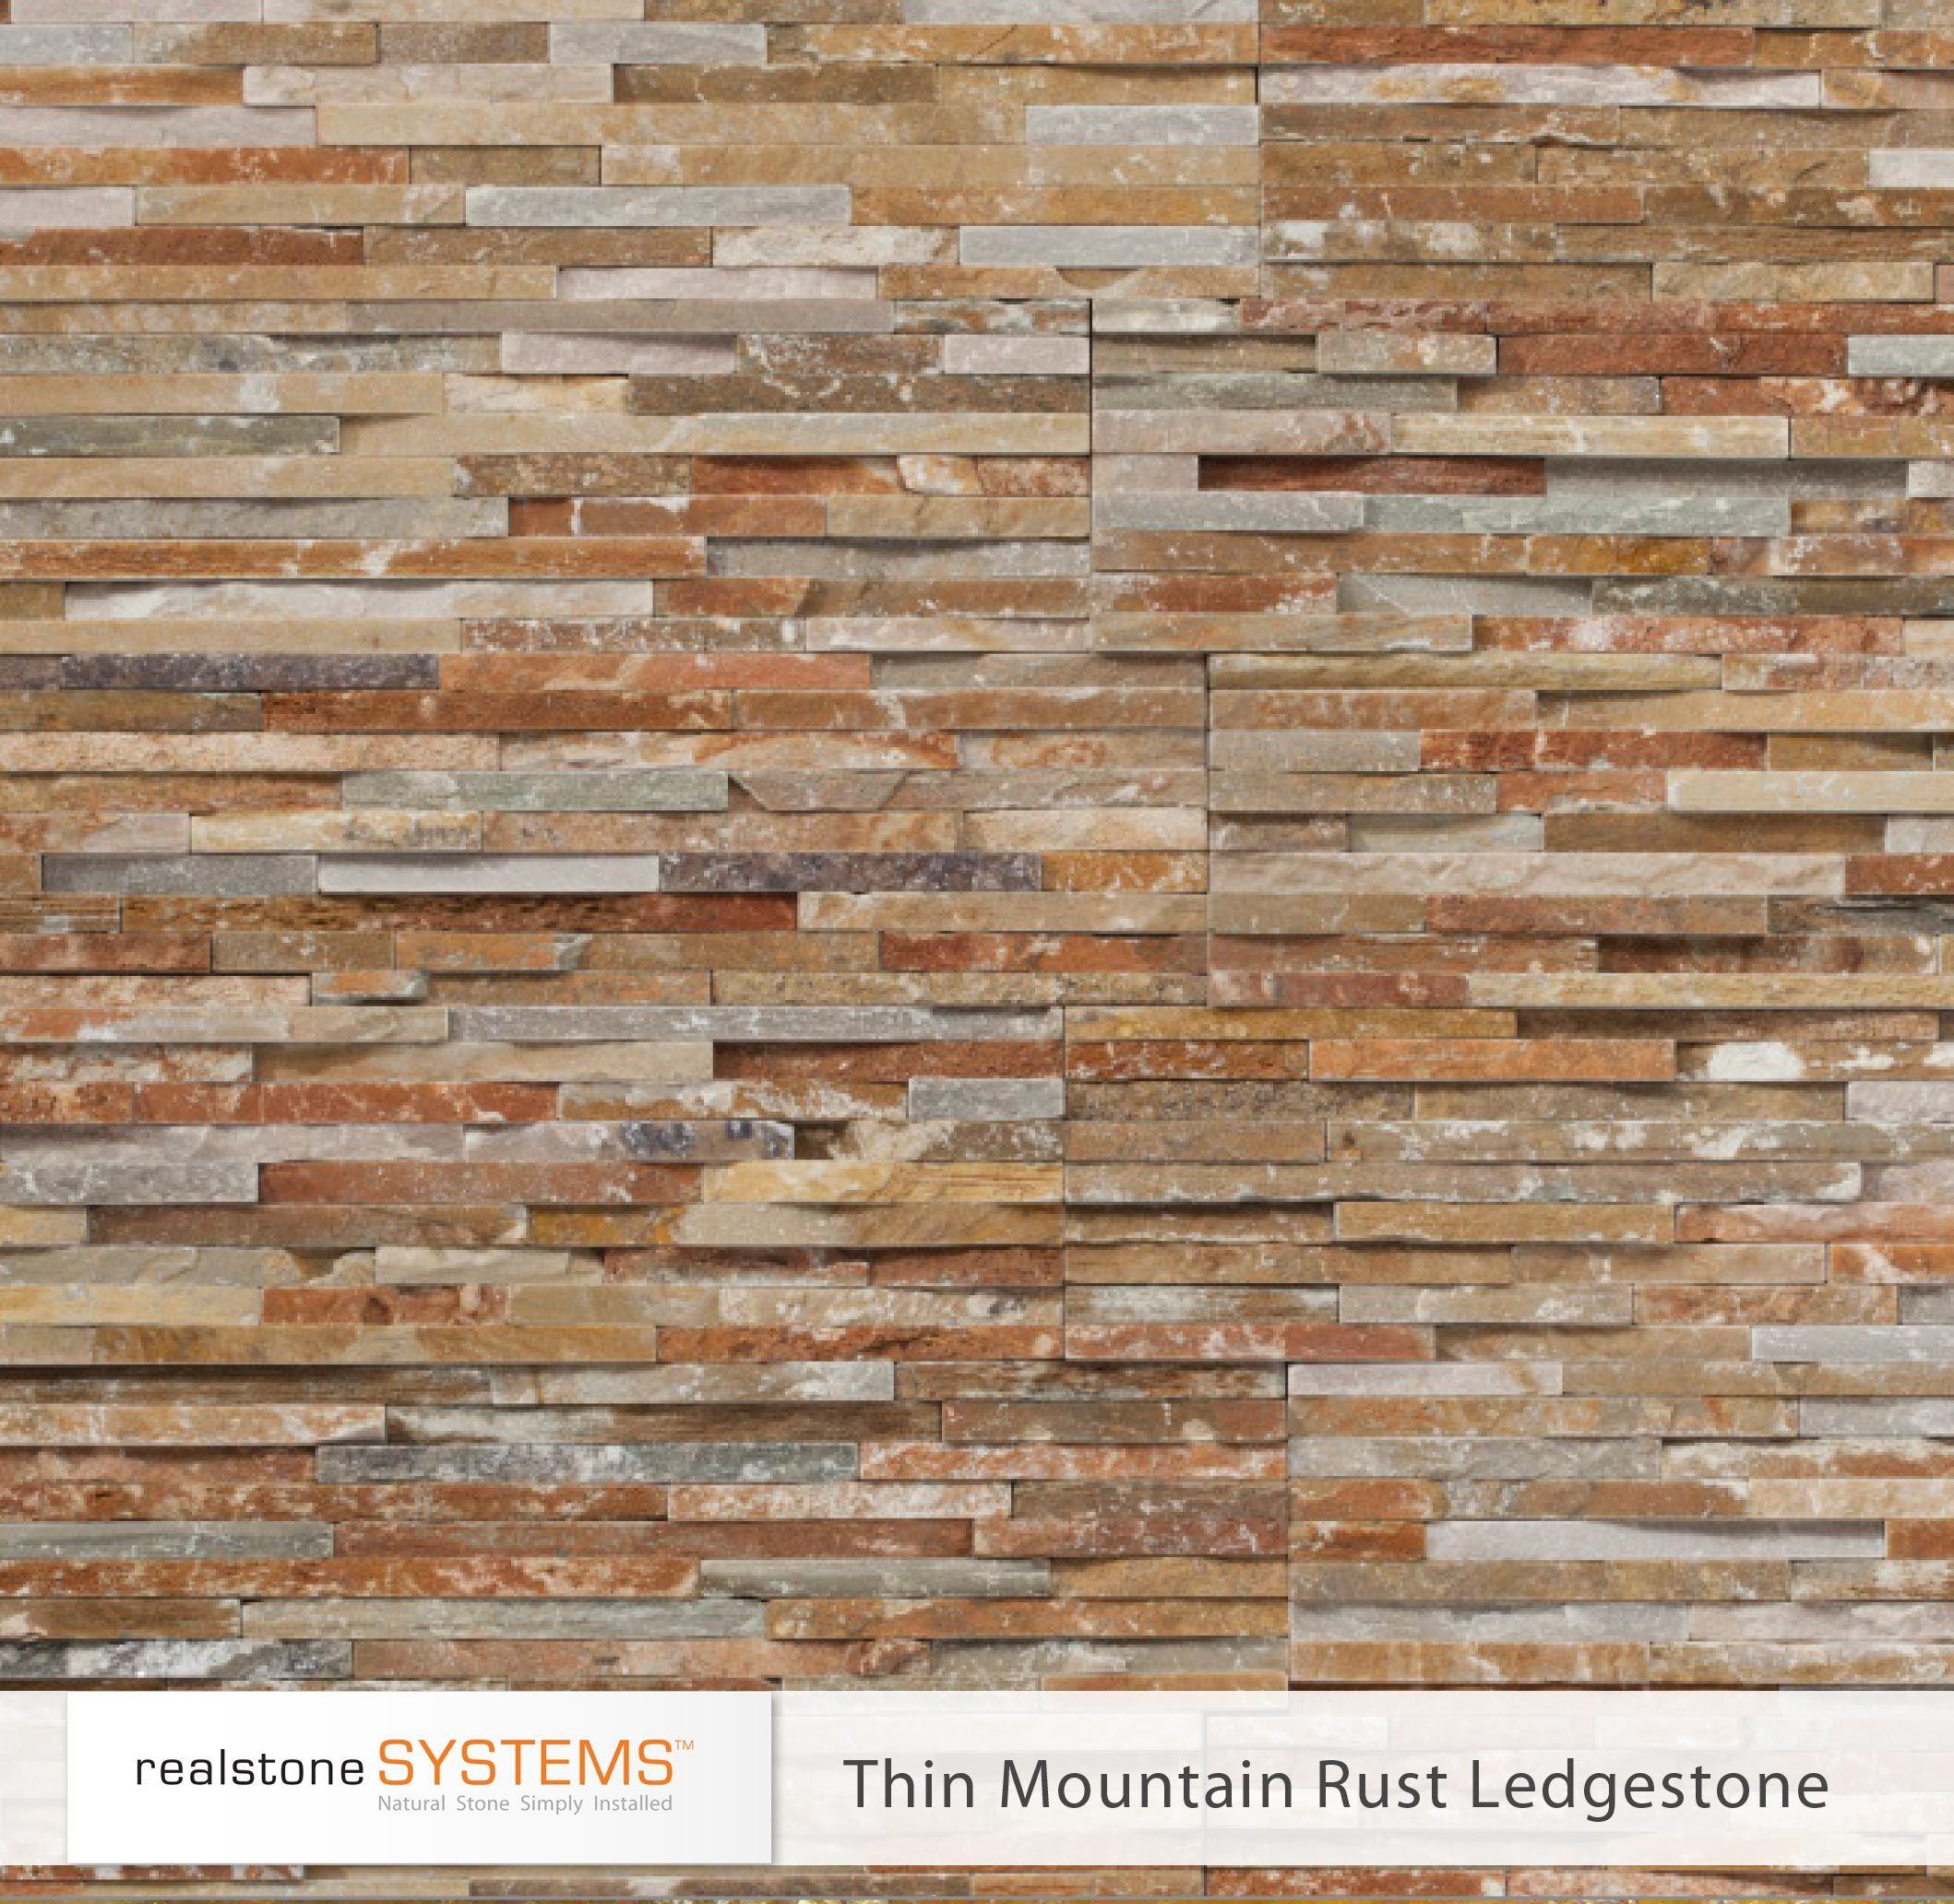 Thin Mountain Rust Ledgestone Thinstone Veneers from Realstone